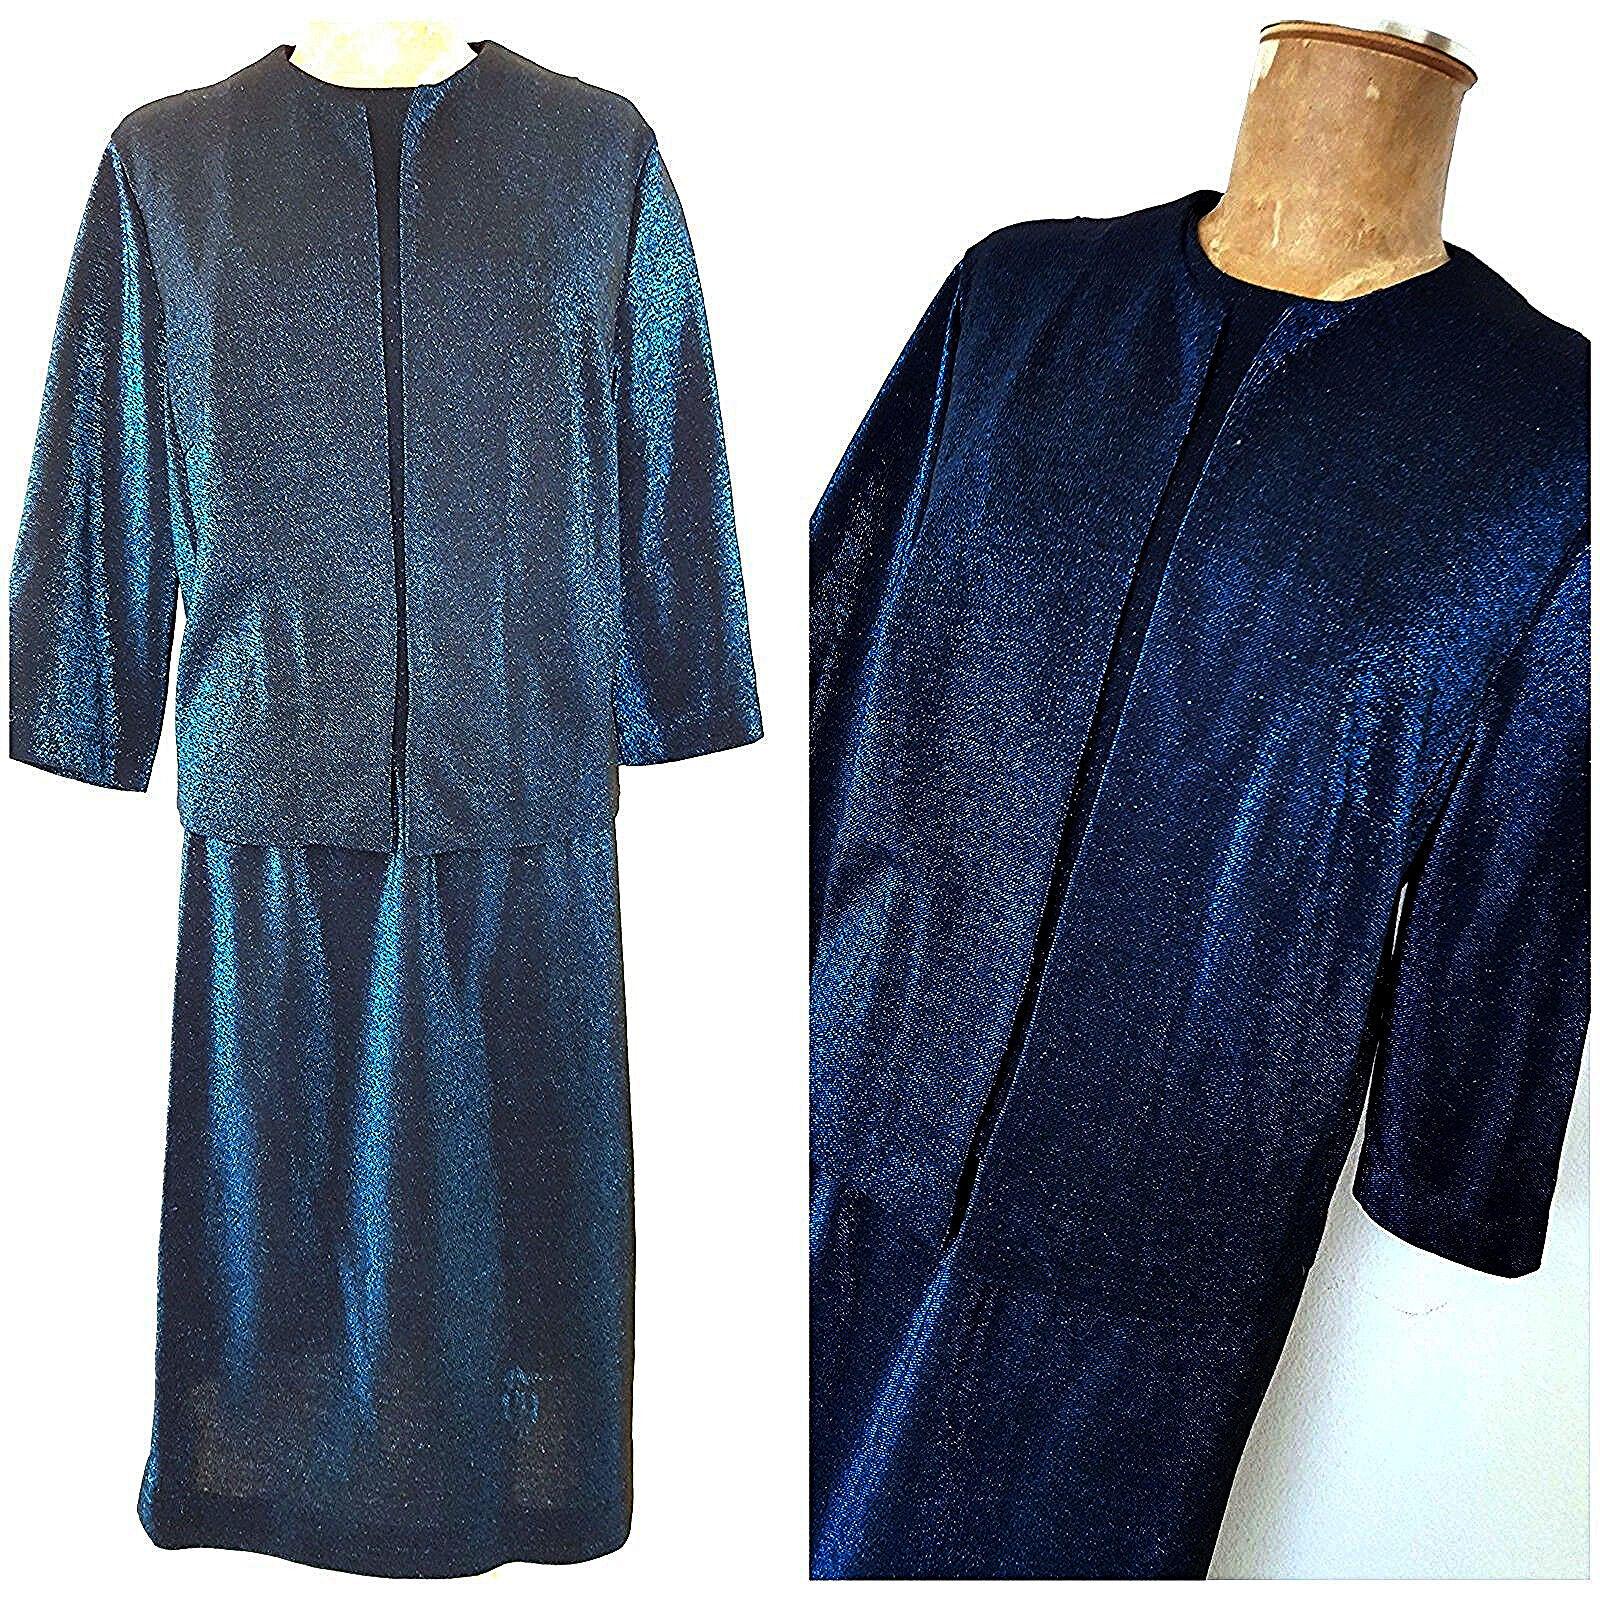 Vintage 70s Metallic Skirt Suit Dress Größe XLarge Pencil Blau MOD Business Pinup